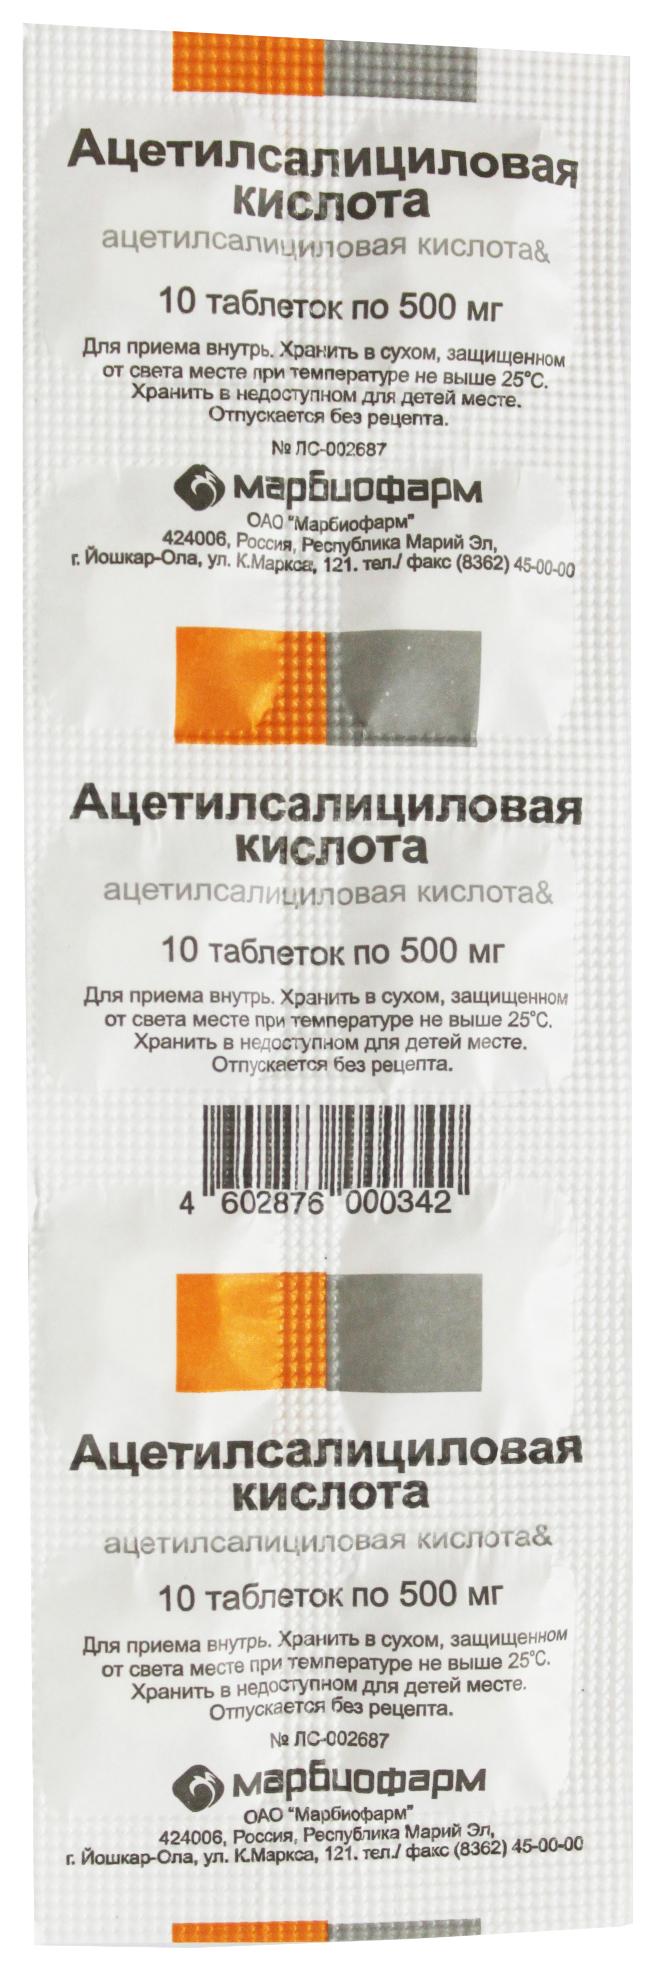 Купить Анальгин таблетки 500 мг 10 шт. Марбиофарм, Марбиофарм ОАО